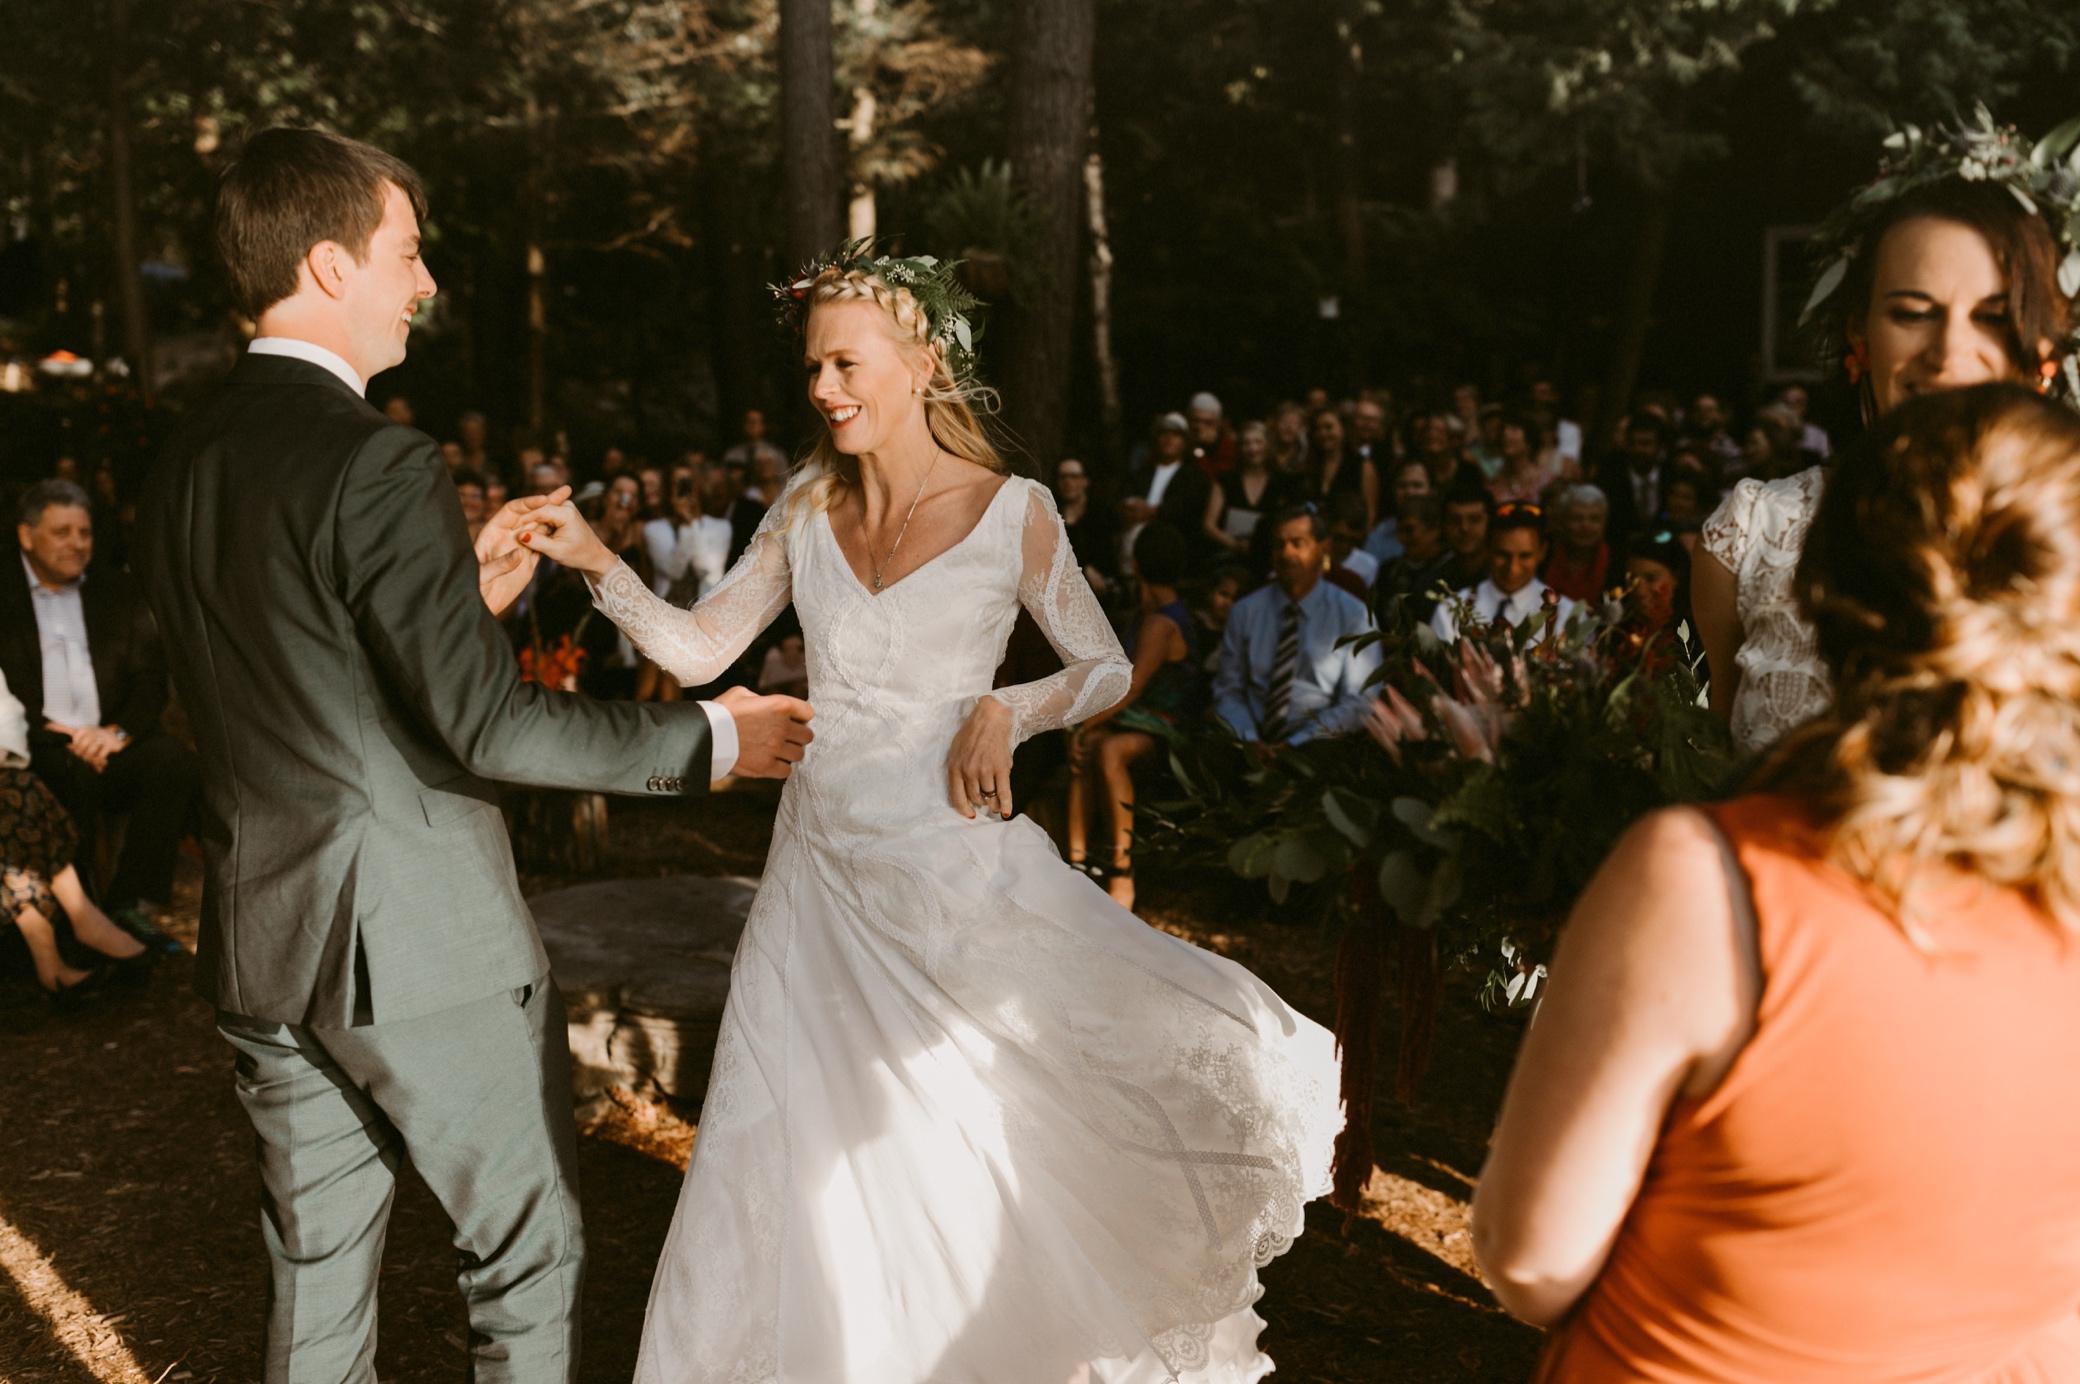 101_Huntsville Wedding  (479 of 689)_Ontario_Cottage_Huntsville_Wedding.jpg